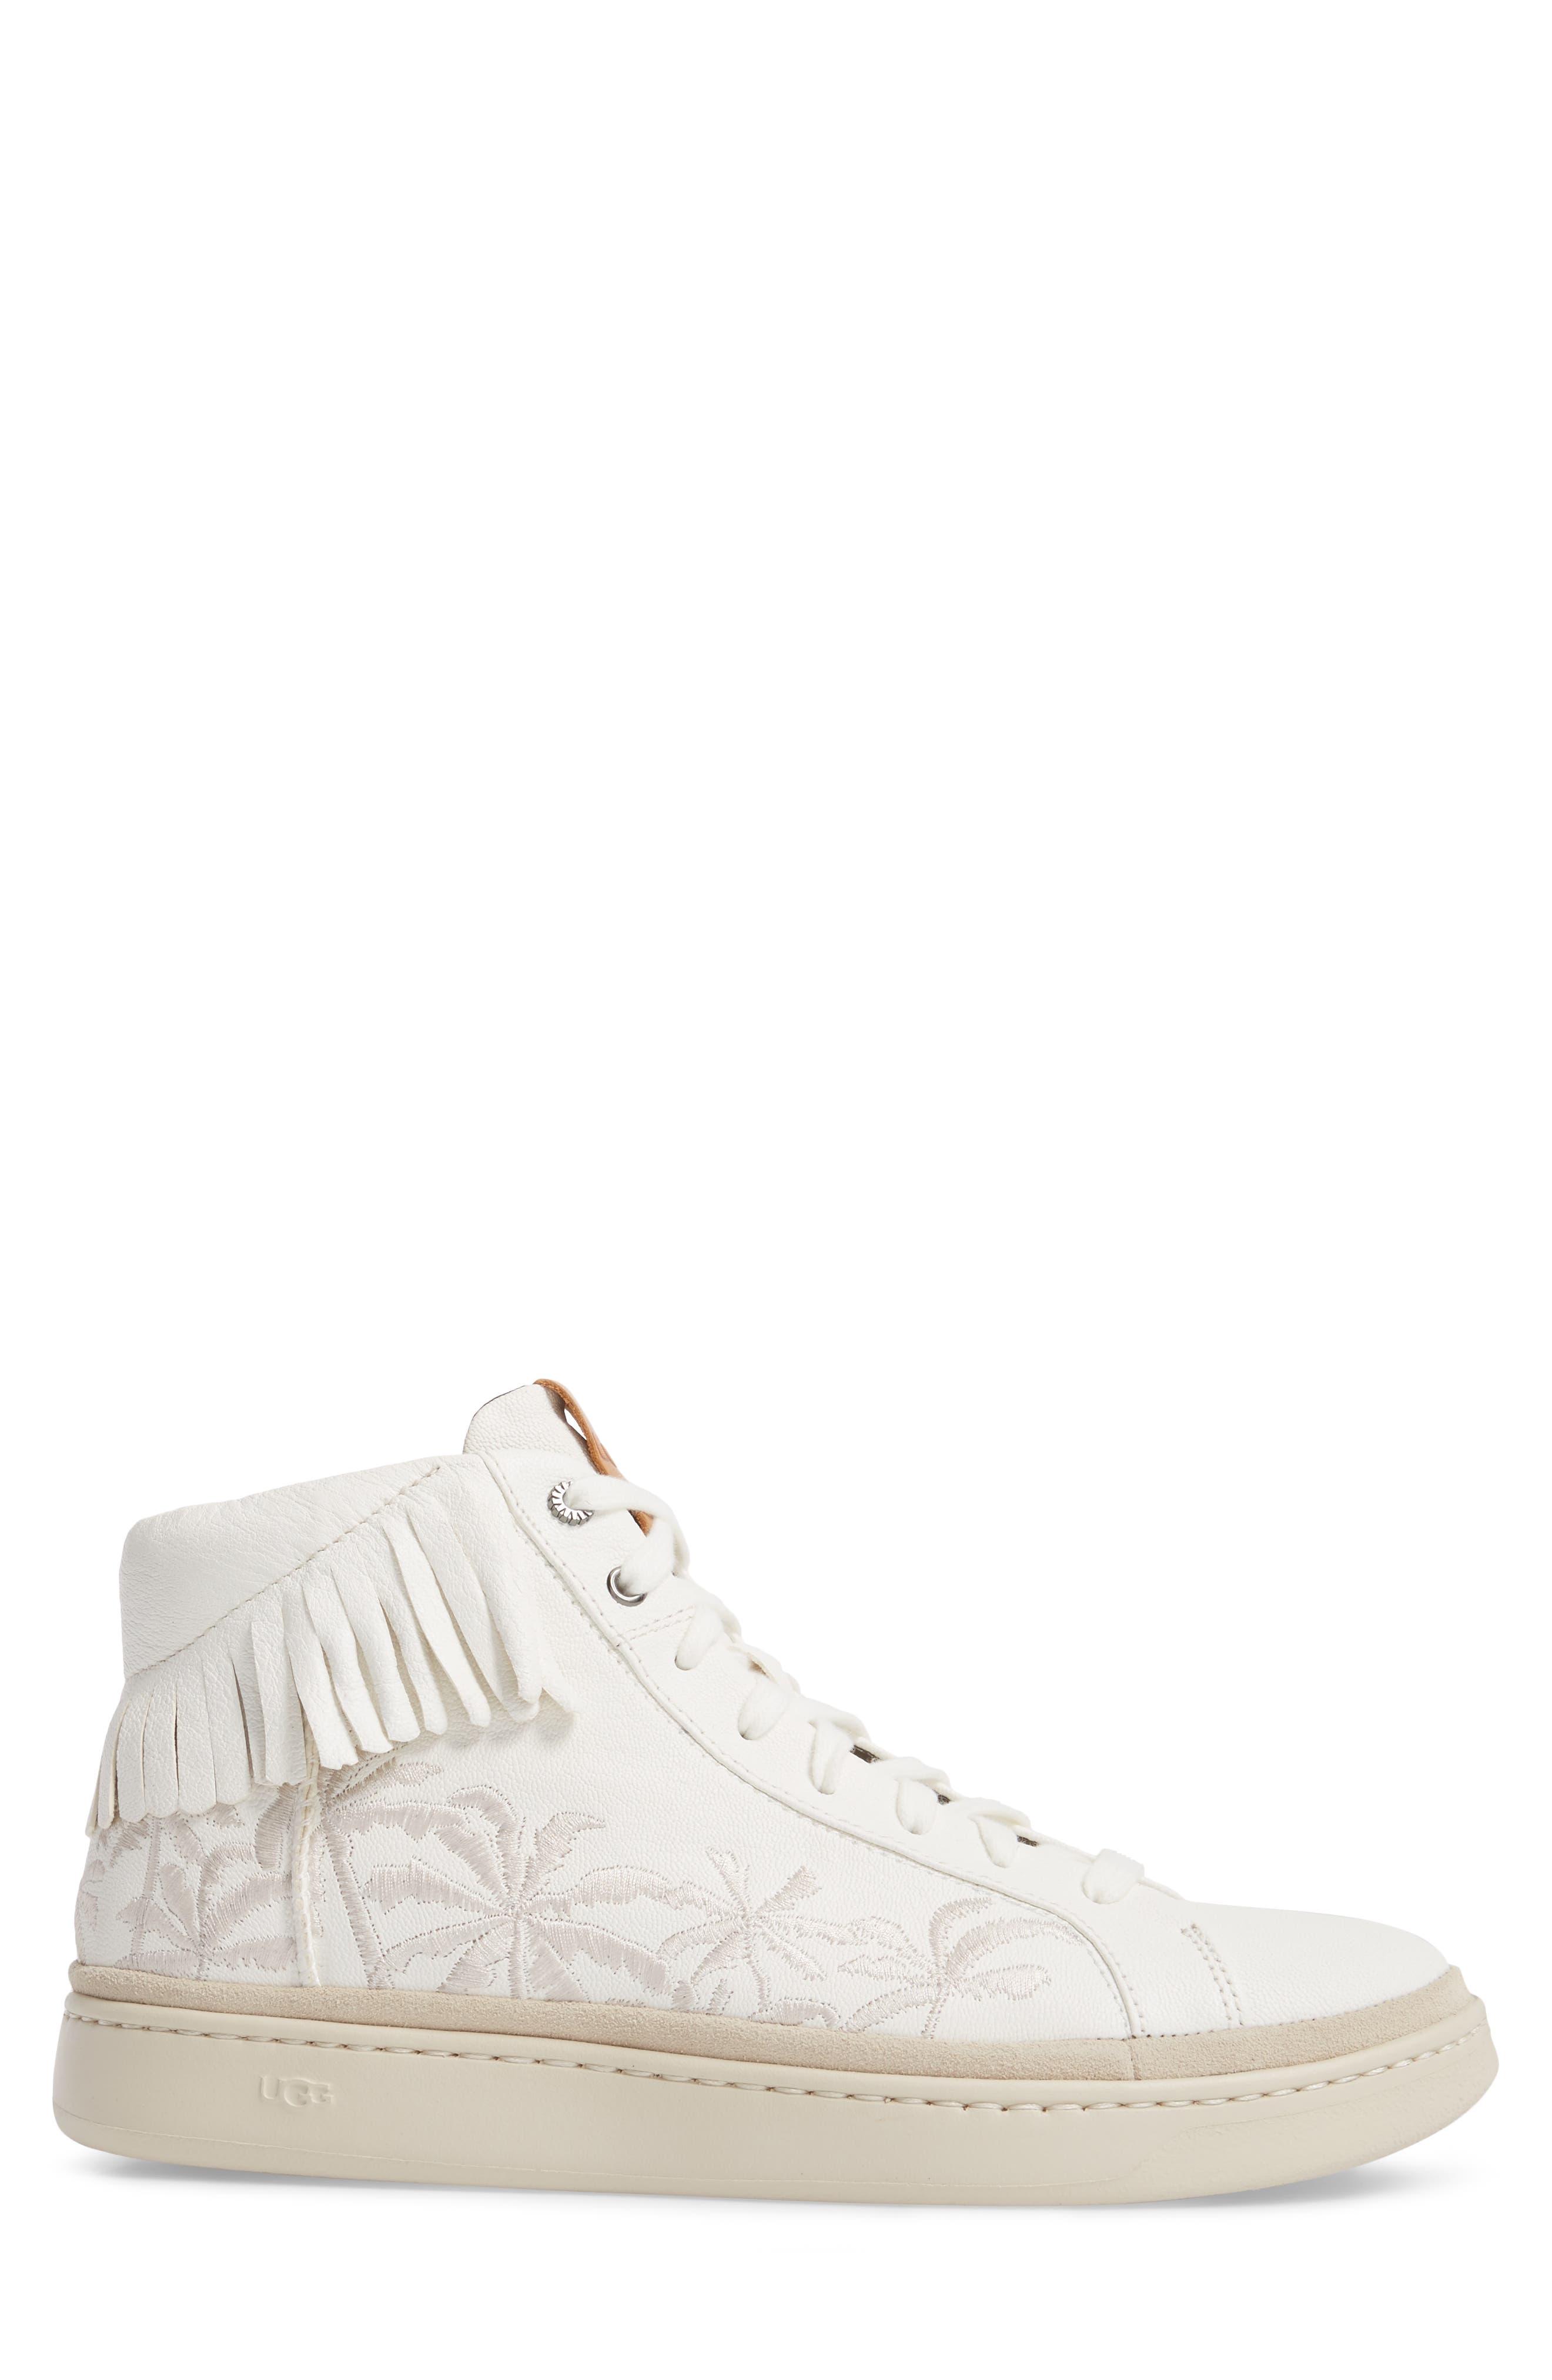 Cali Fringe High Top Sneaker,                             Alternate thumbnail 3, color,                             White Leather